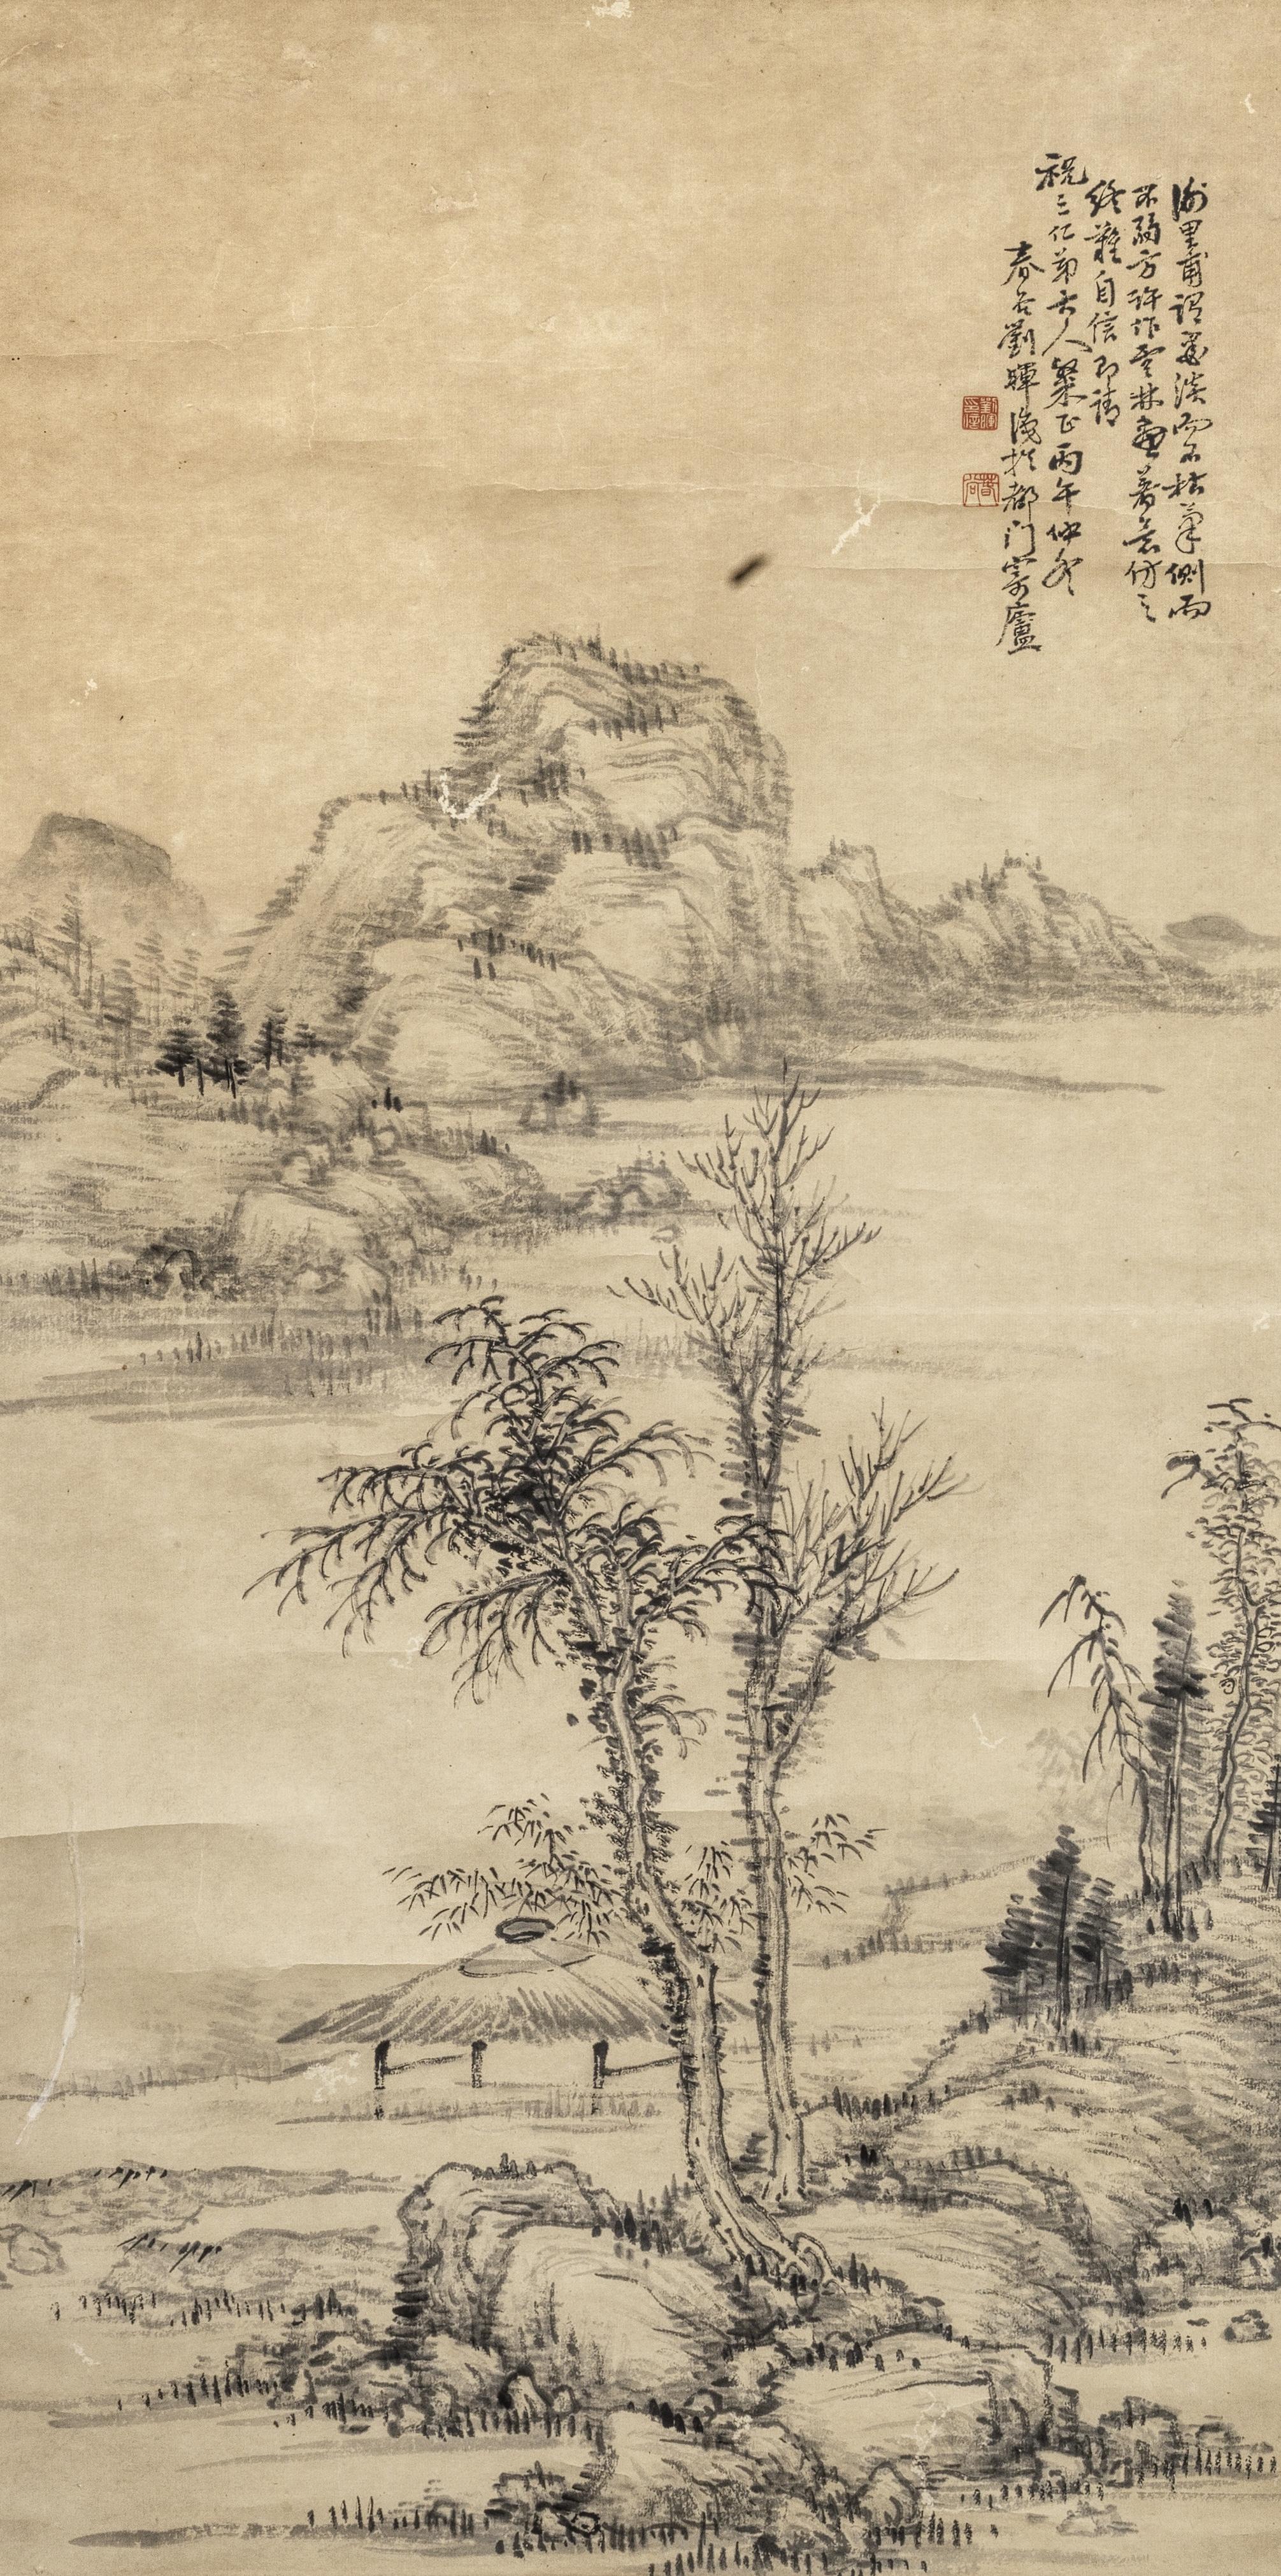 LIU HUI (CHUNGU) (1851-1926) 'Scholar's retreat'